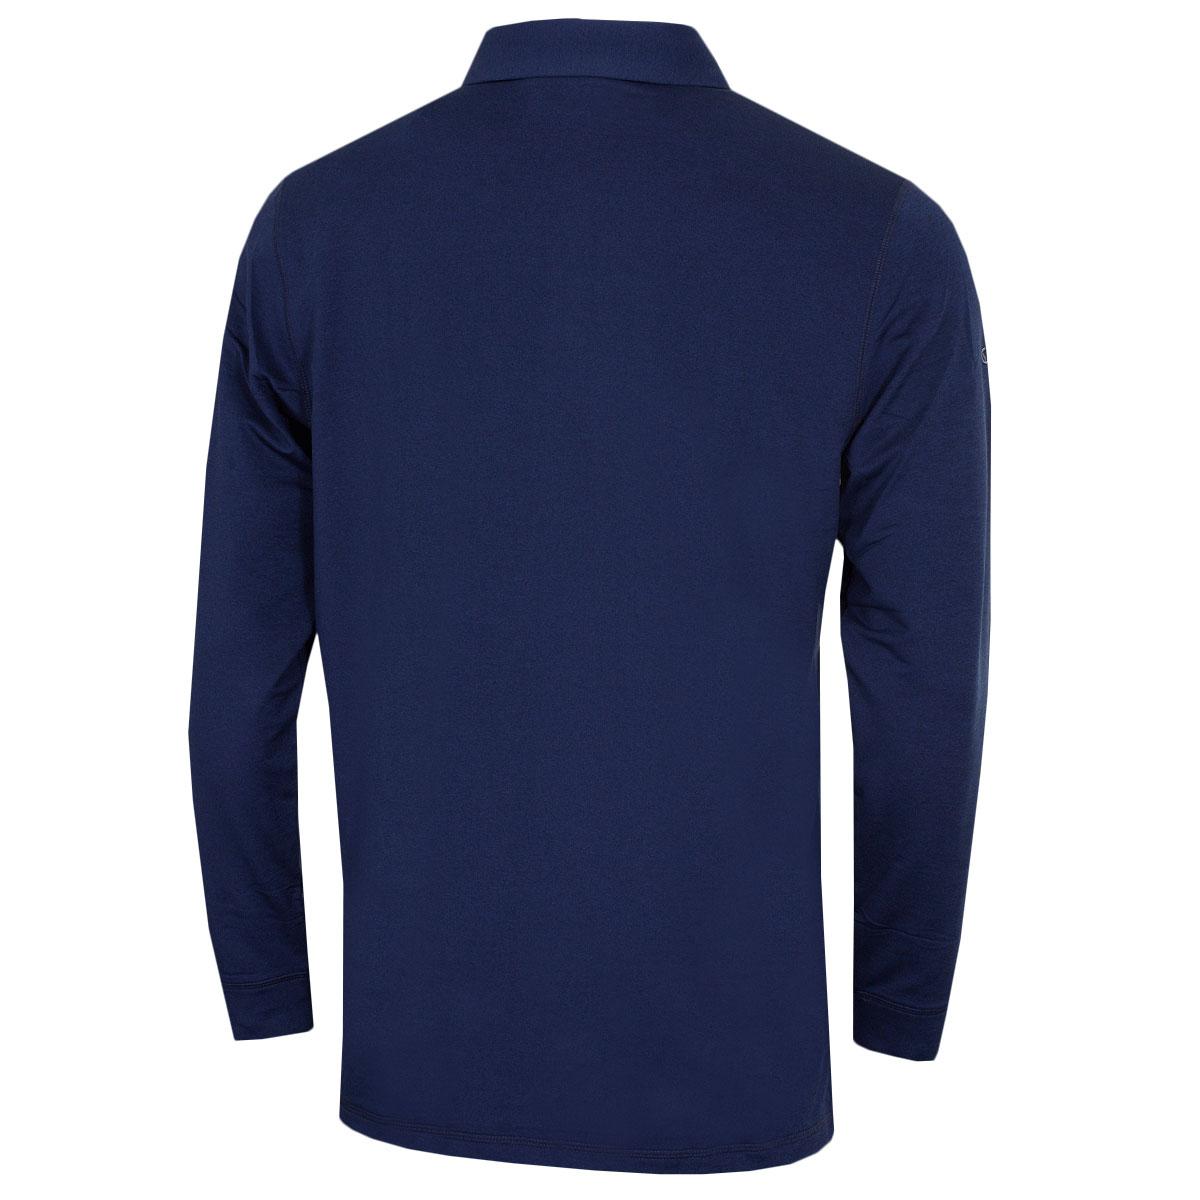 Callaway-Golf-Mens-2019-Long-Sleeve-Stretch-Opti-Dri-Polo-Shirt thumbnail 3